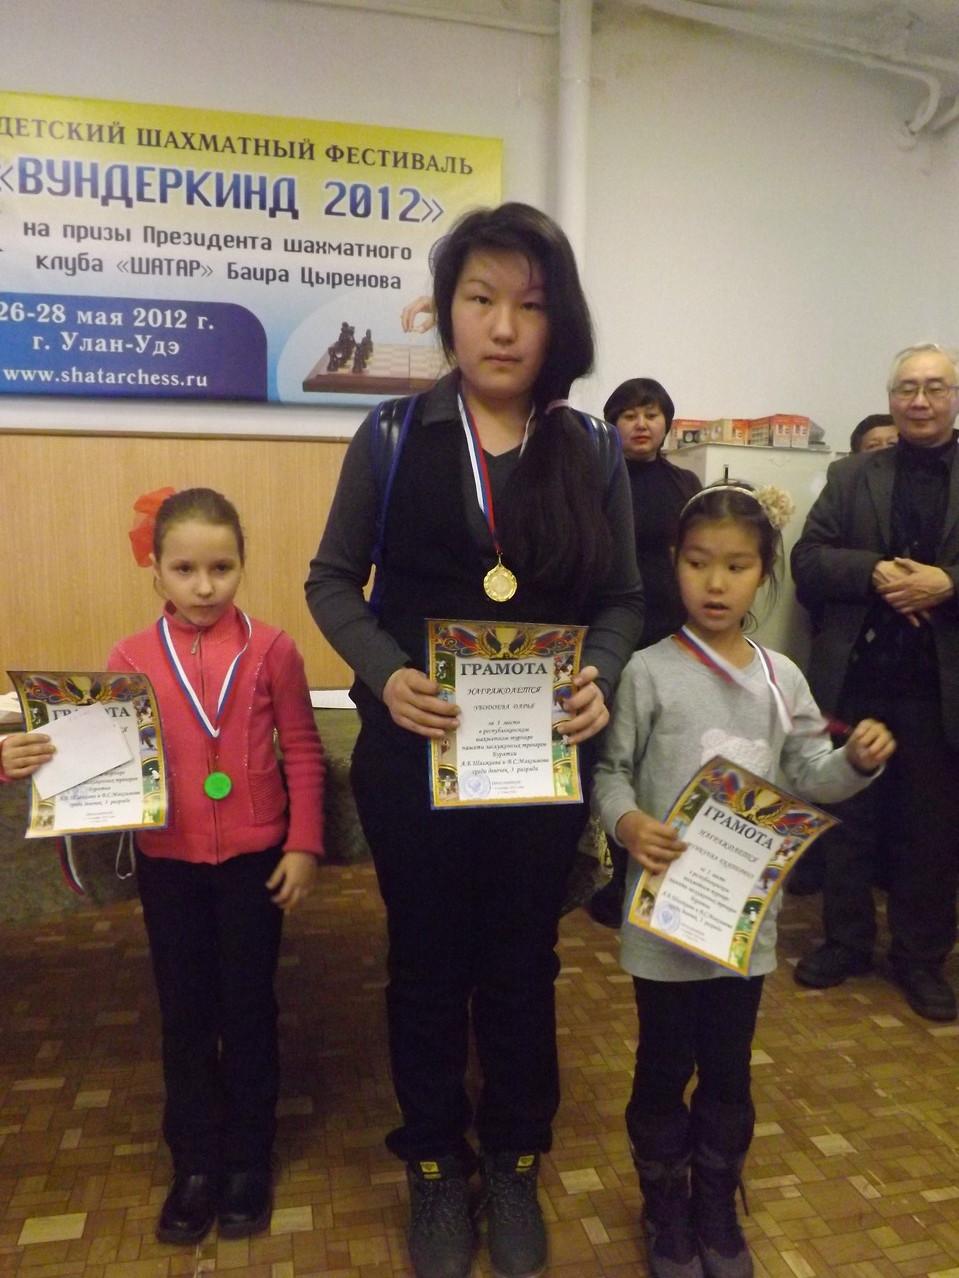 Семенова Марина, Убодоева Дарья, Мункуева Катя (3 разряды)